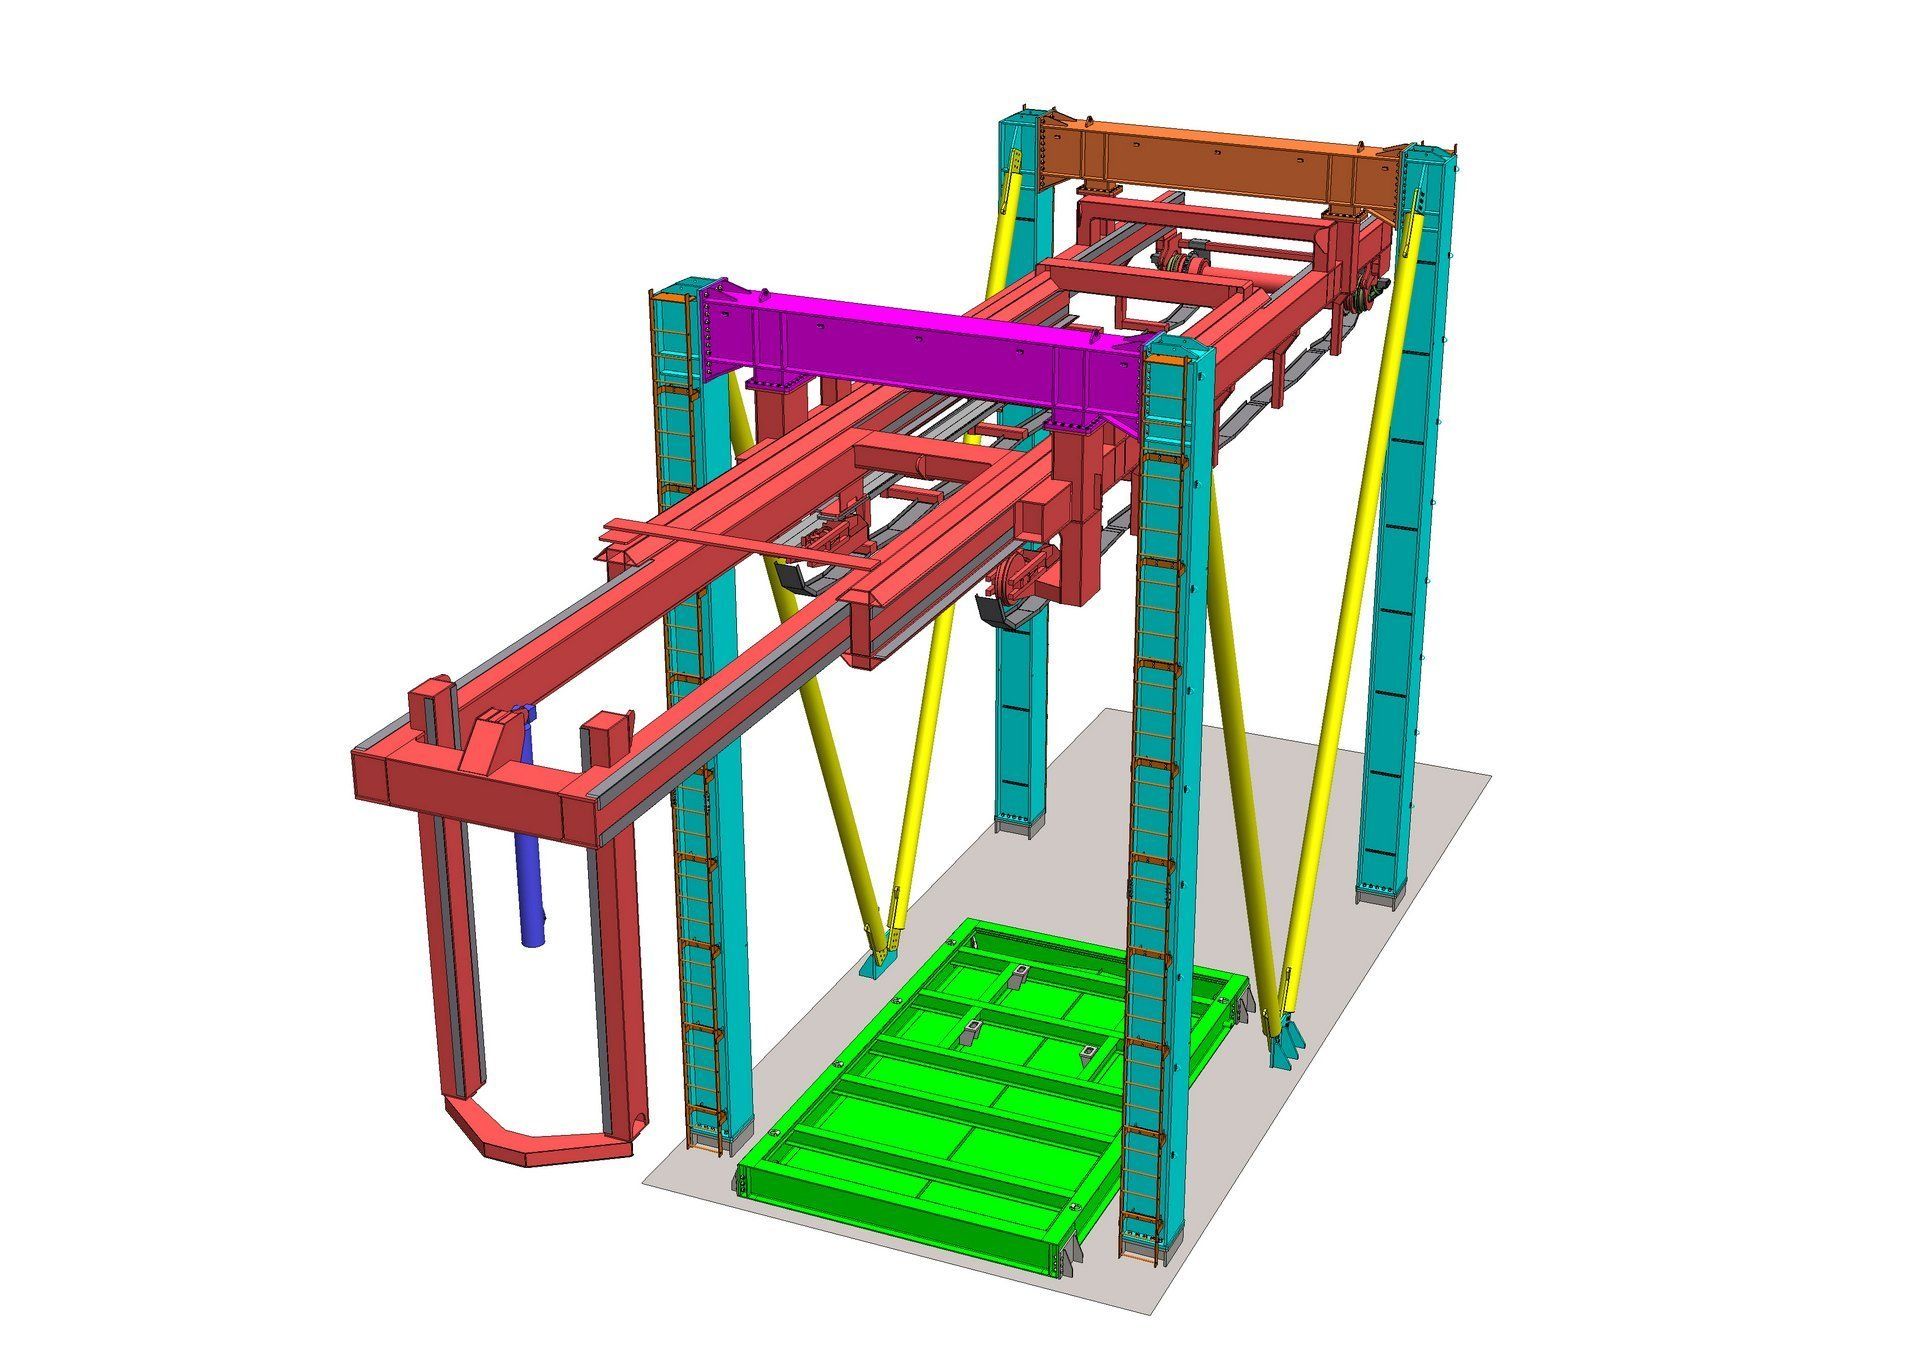 Telescopic crane 3D model